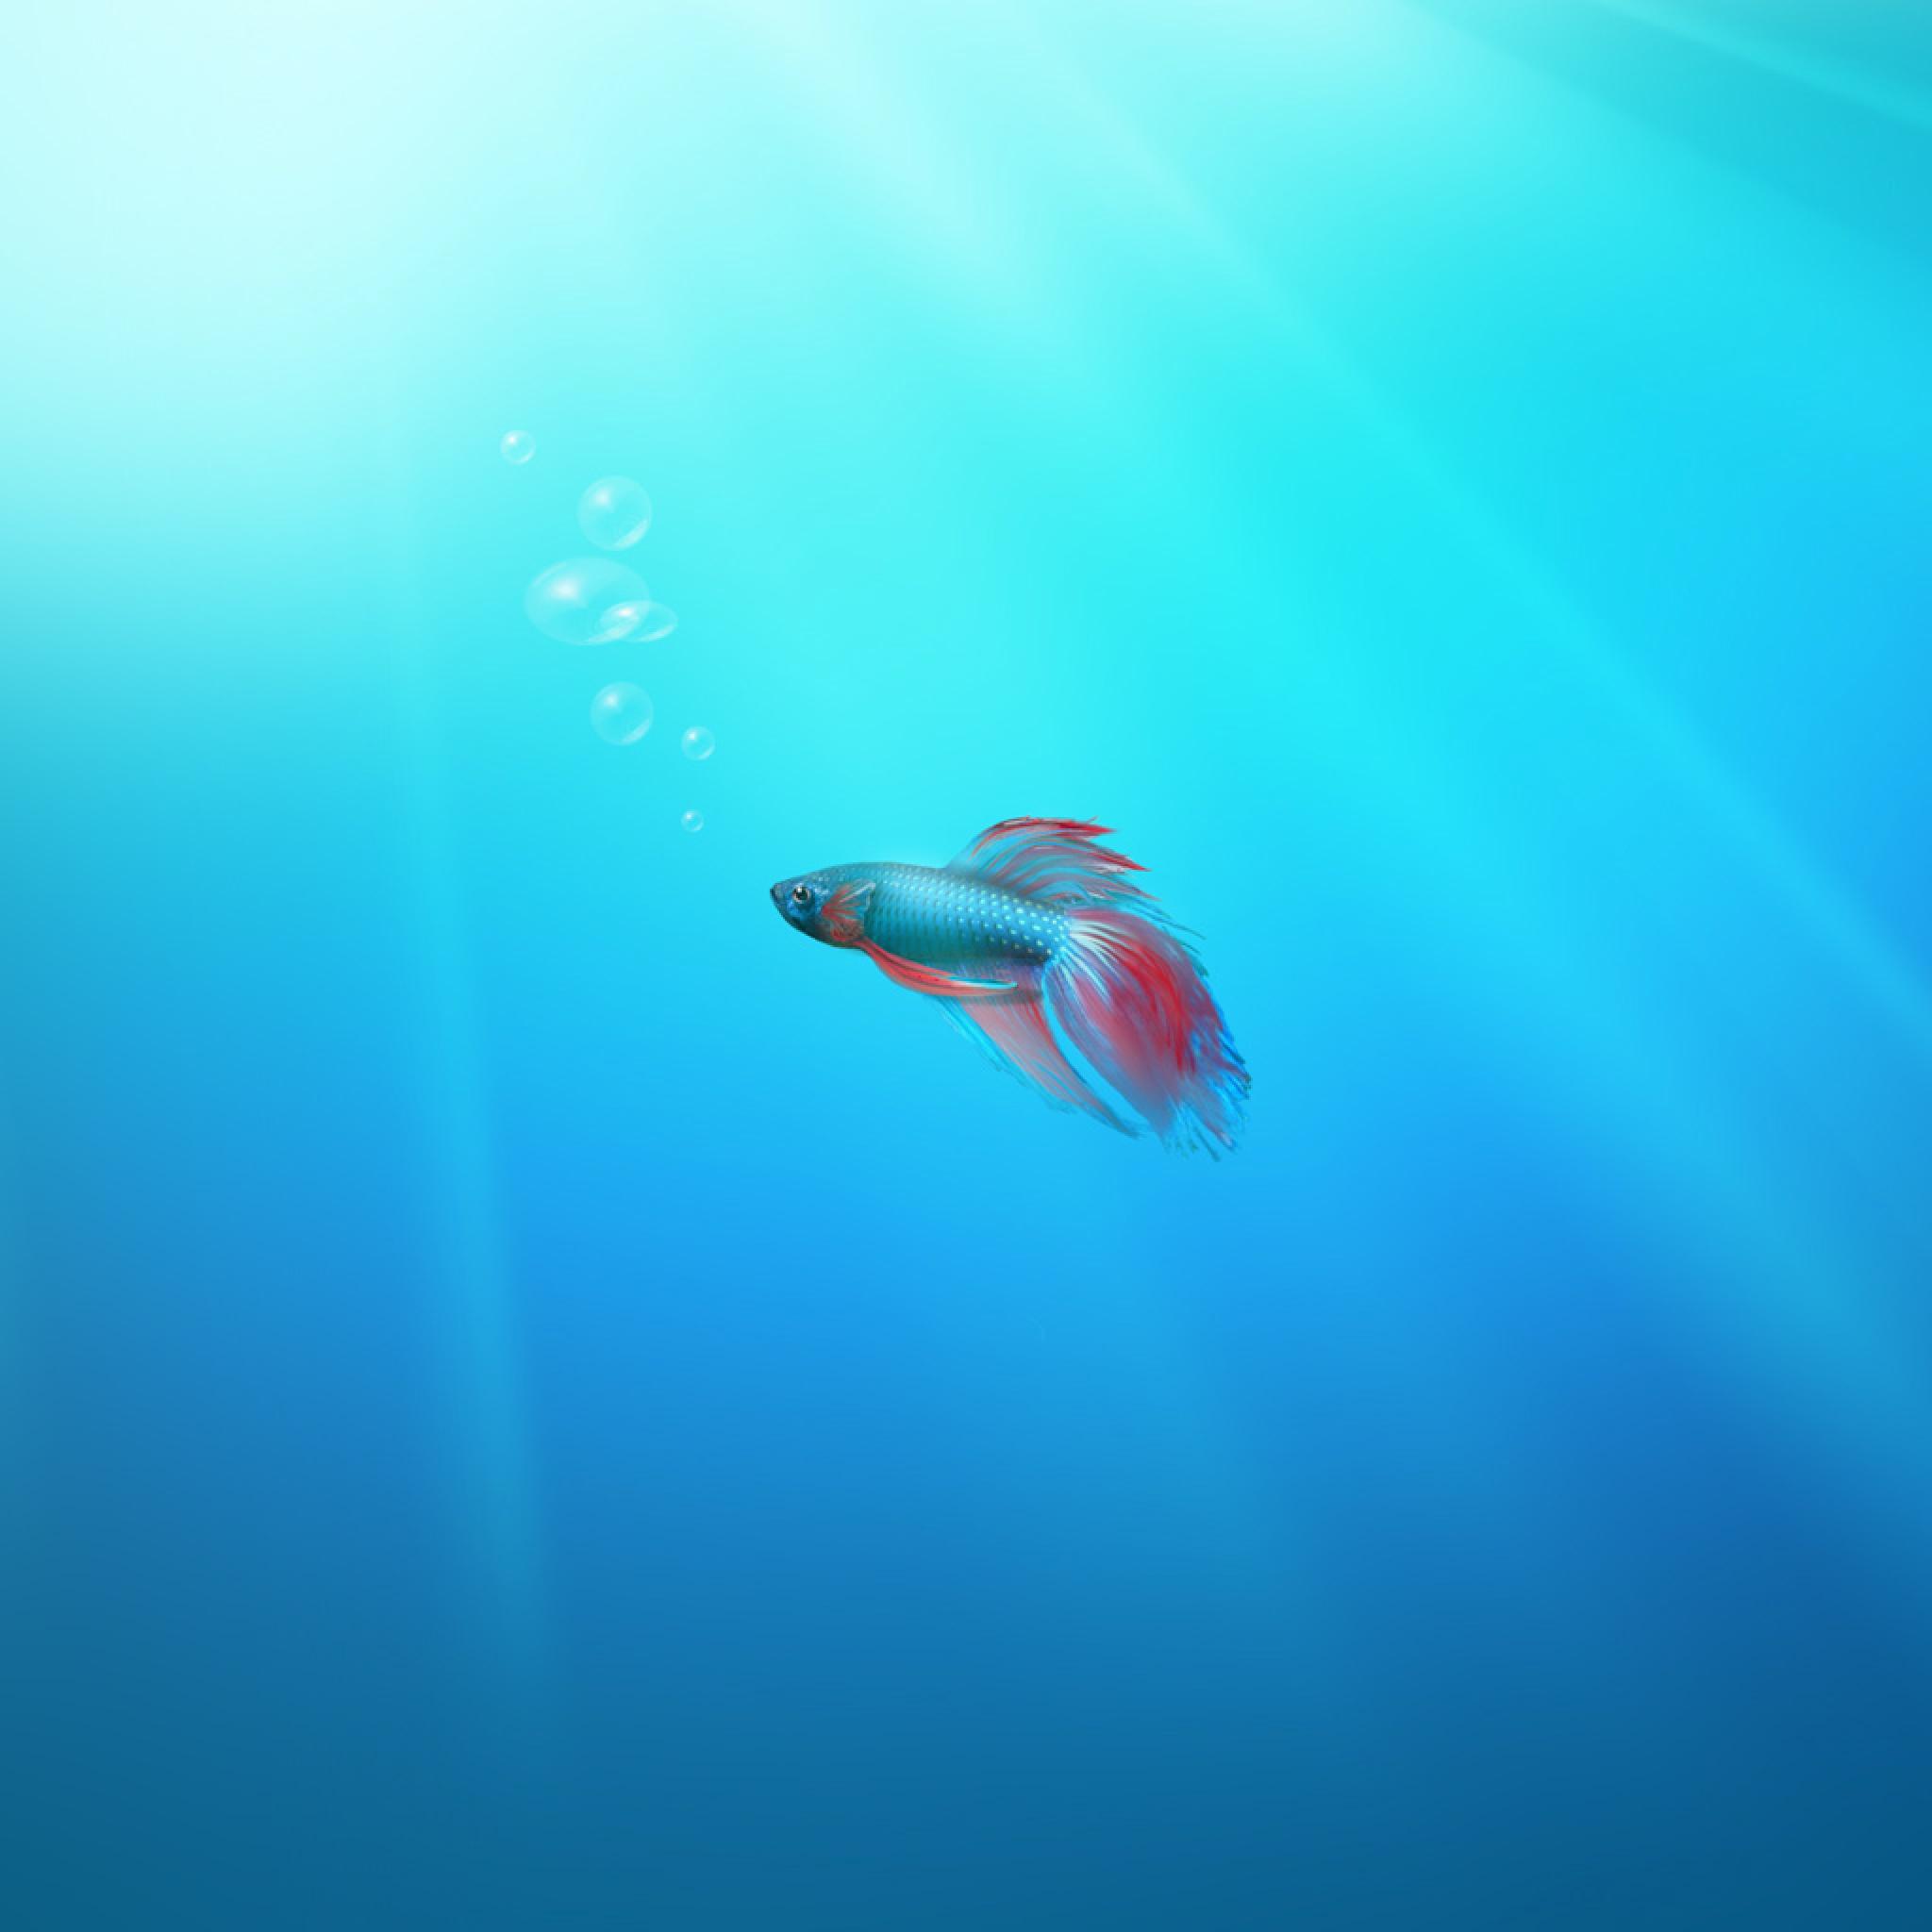 Computers - Windows 7 Beta Fish Wallpaper - iPad iPhone HD ...